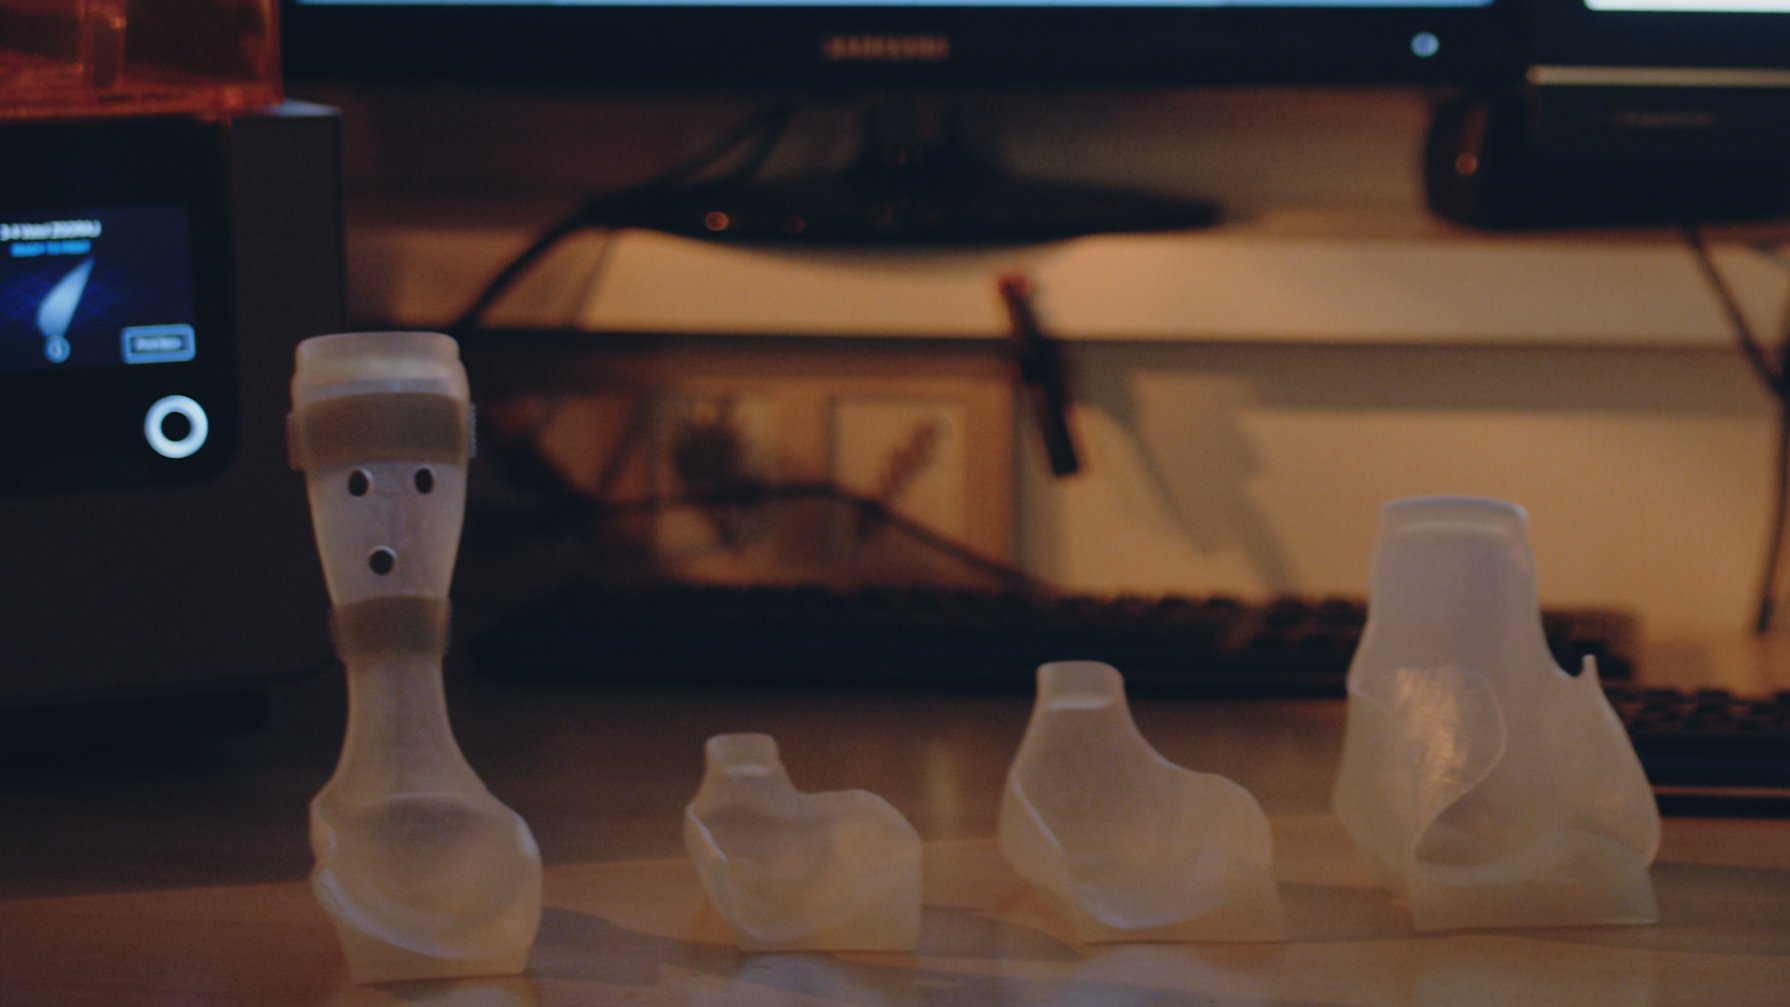 پروژه پرینت سه بعدی پروتز مچ پا Animake